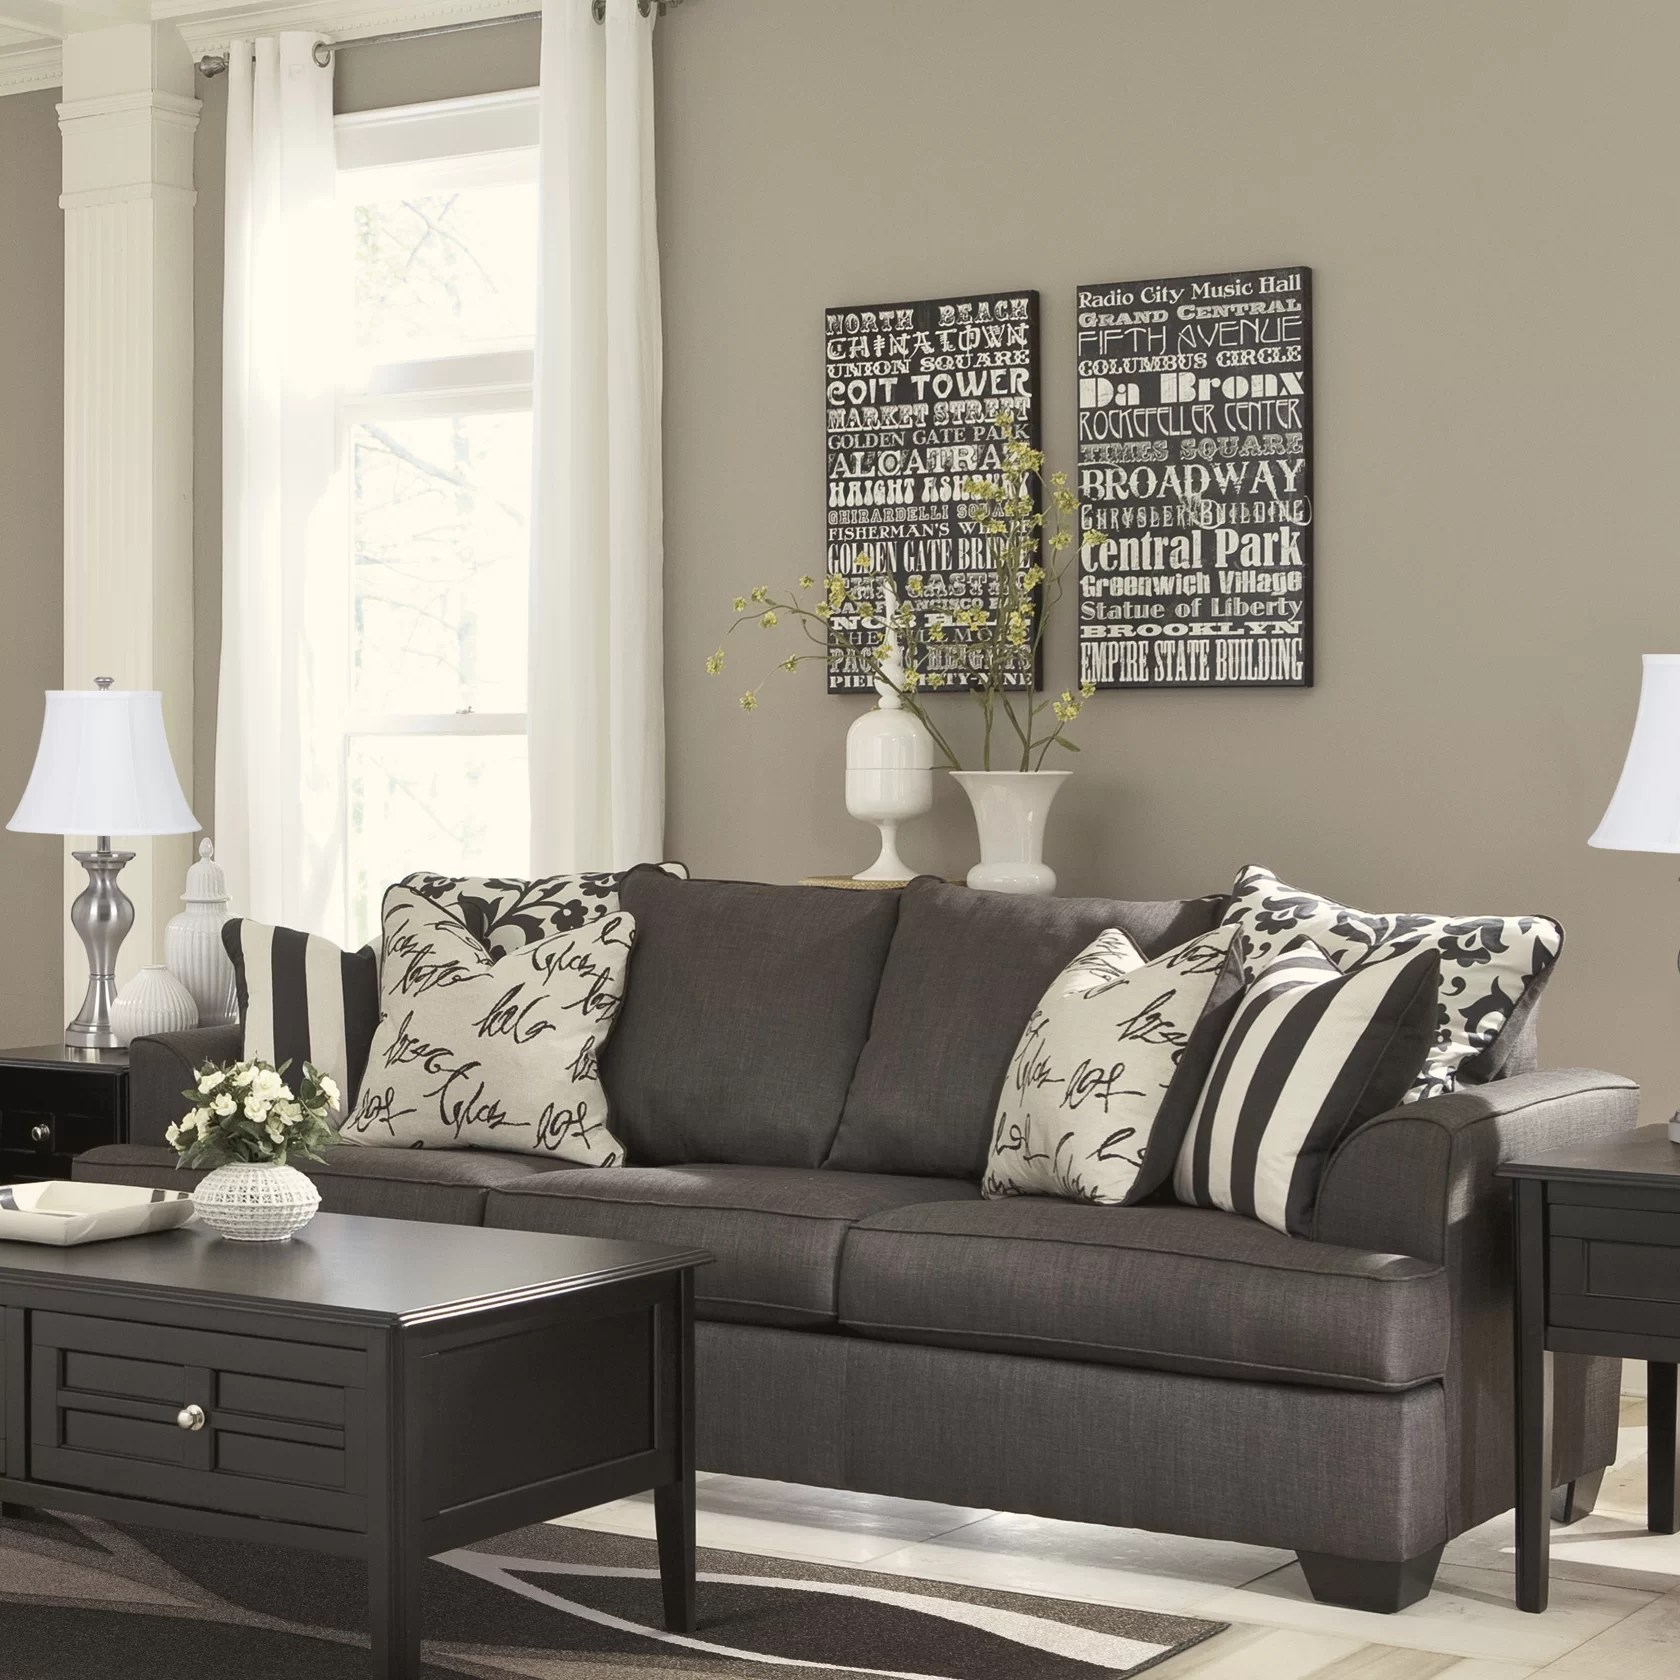 signature design by ashley harvest sleeper sofa making slipcovers for cushions hobson wayfair